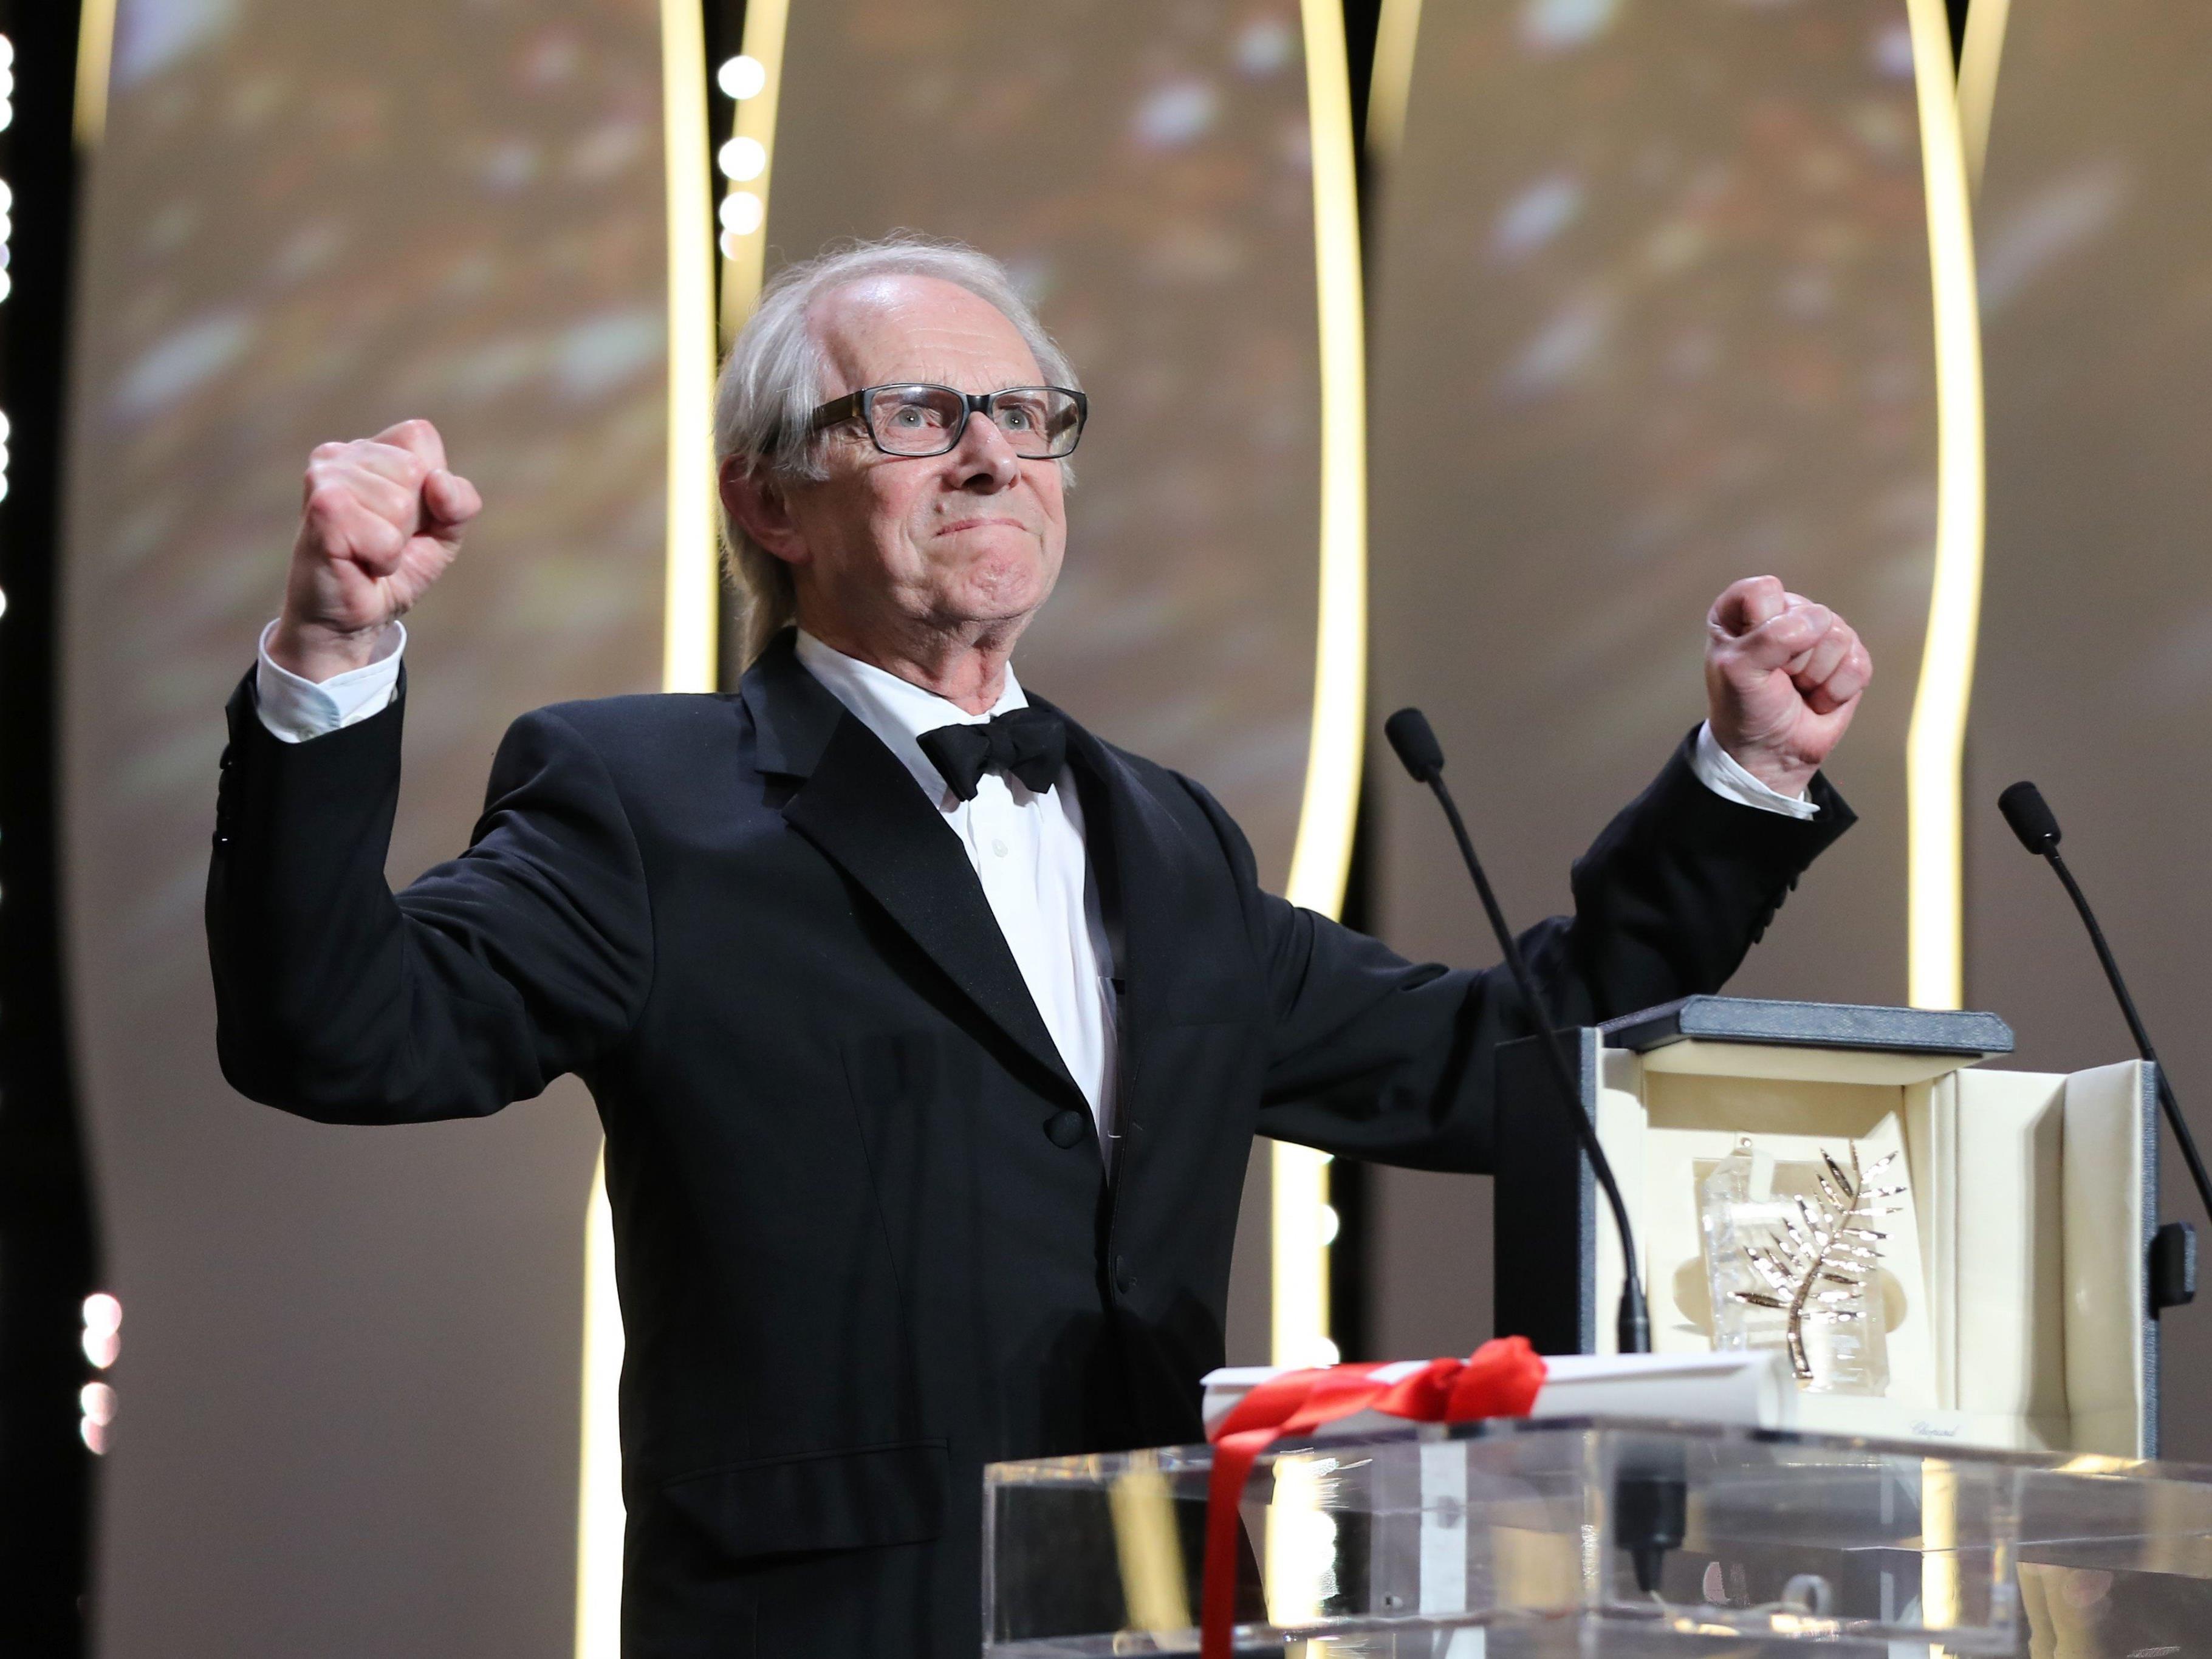 Ken Loach gewinnt die goldene Palme in Cannes.